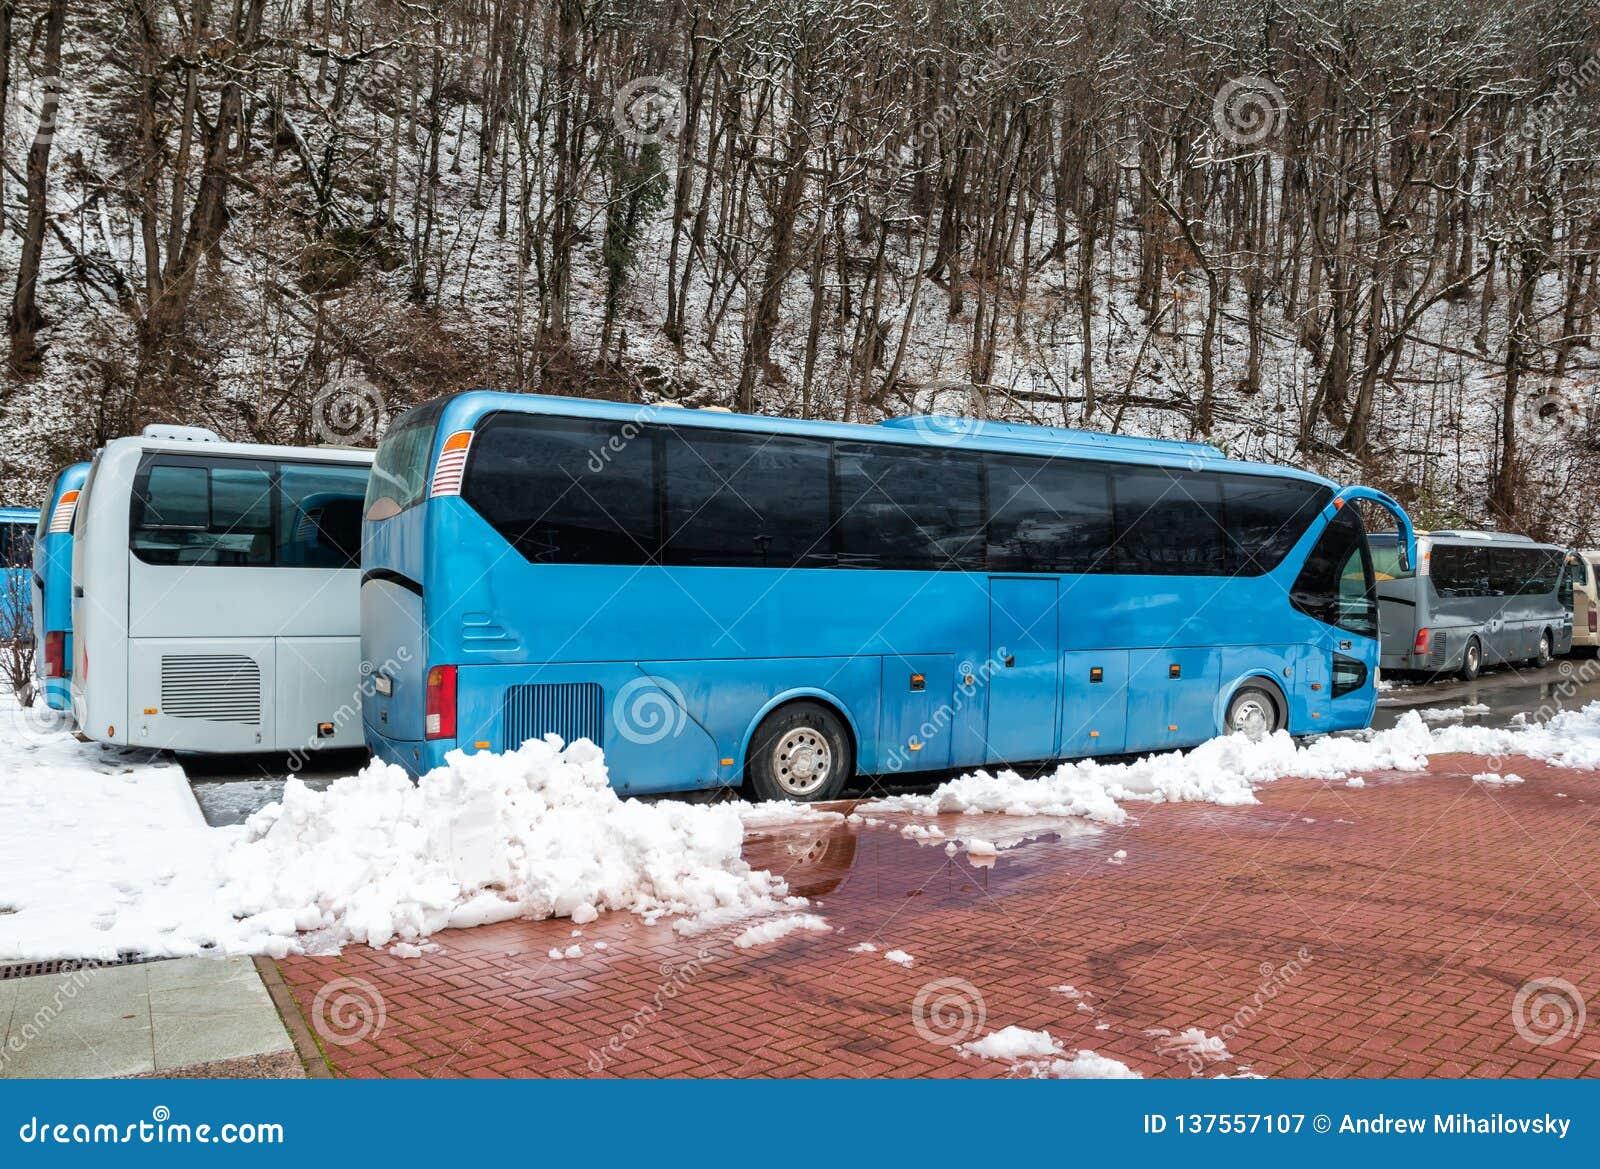 Intercity λεωφορεία που σταθμεύουν κοντά στο δάσος βουνών στο χειμώνα